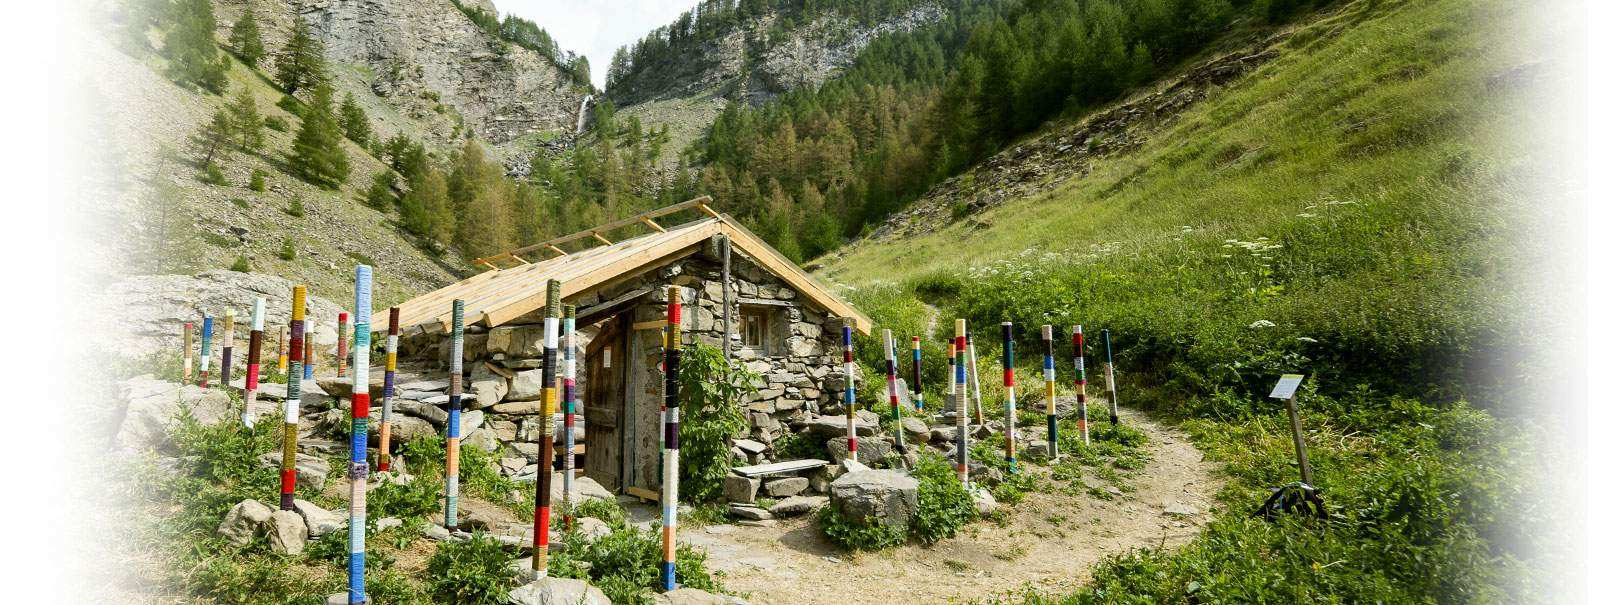 la cabane du berger cabane au sol lodge en provence alpes c te d 39 azur cabanes de france. Black Bedroom Furniture Sets. Home Design Ideas